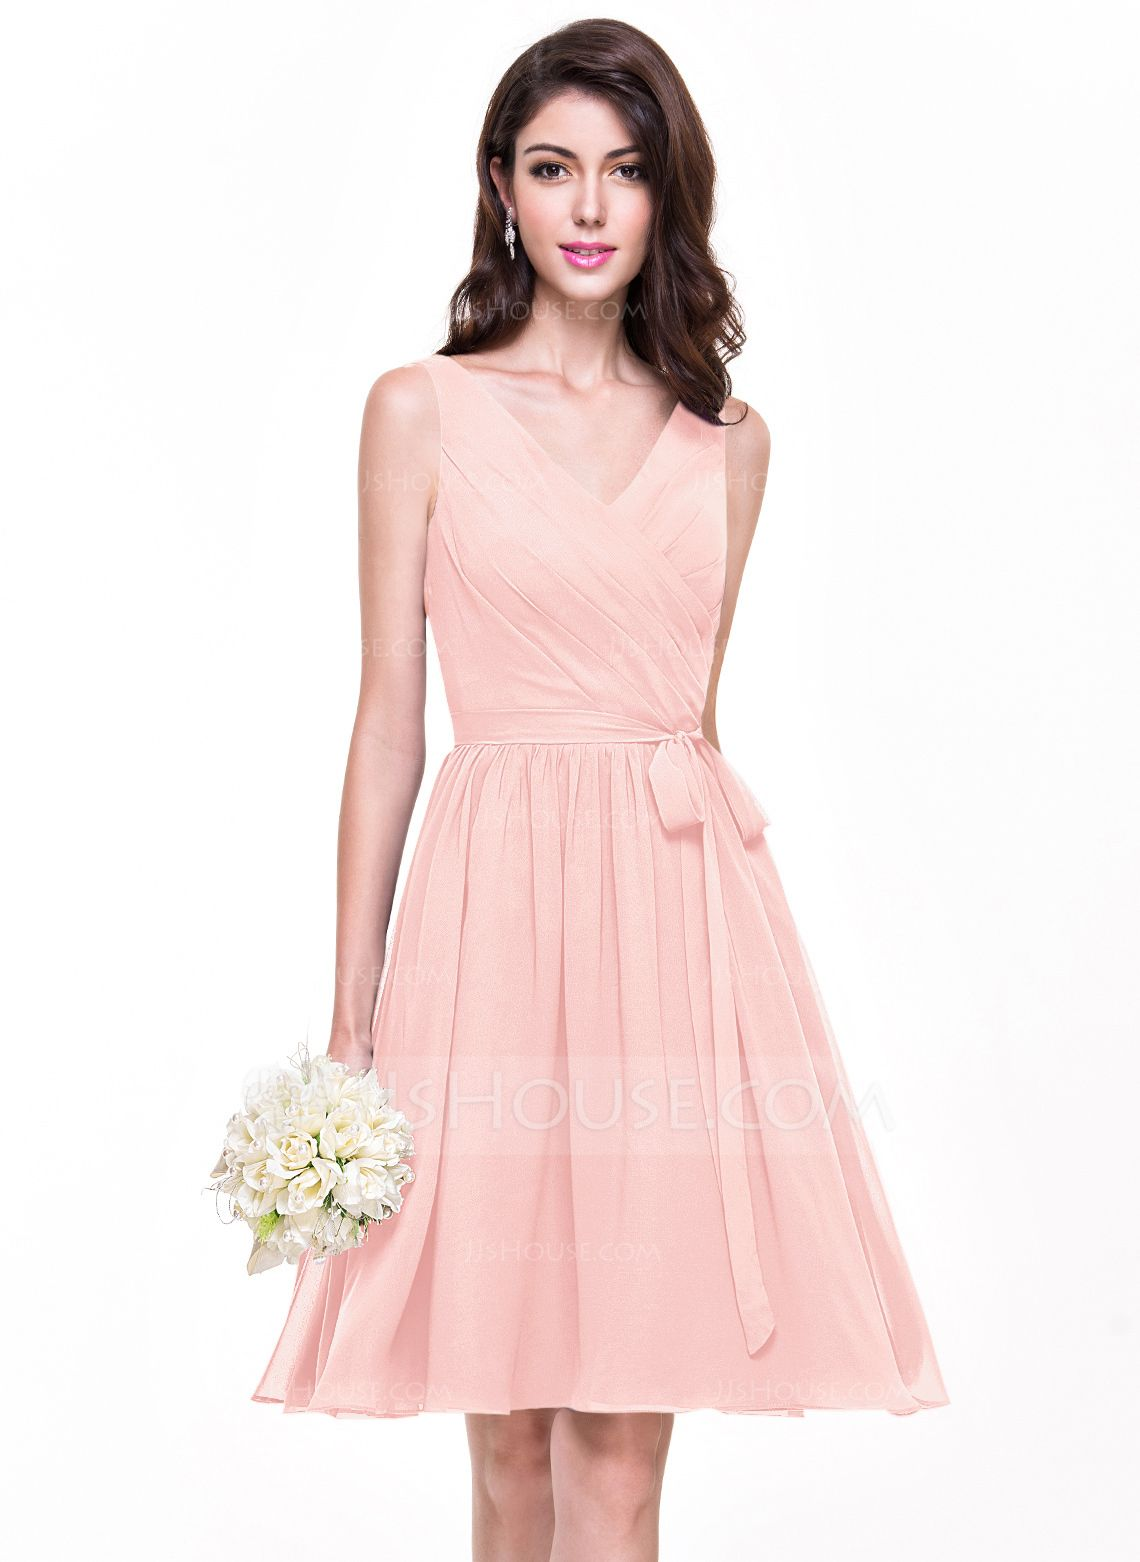 A-Line/Princess V-neck Knee-Length Chiffon Bridesmaid Dress With Ruffle Bow(s) (007068152) - JJsHouse